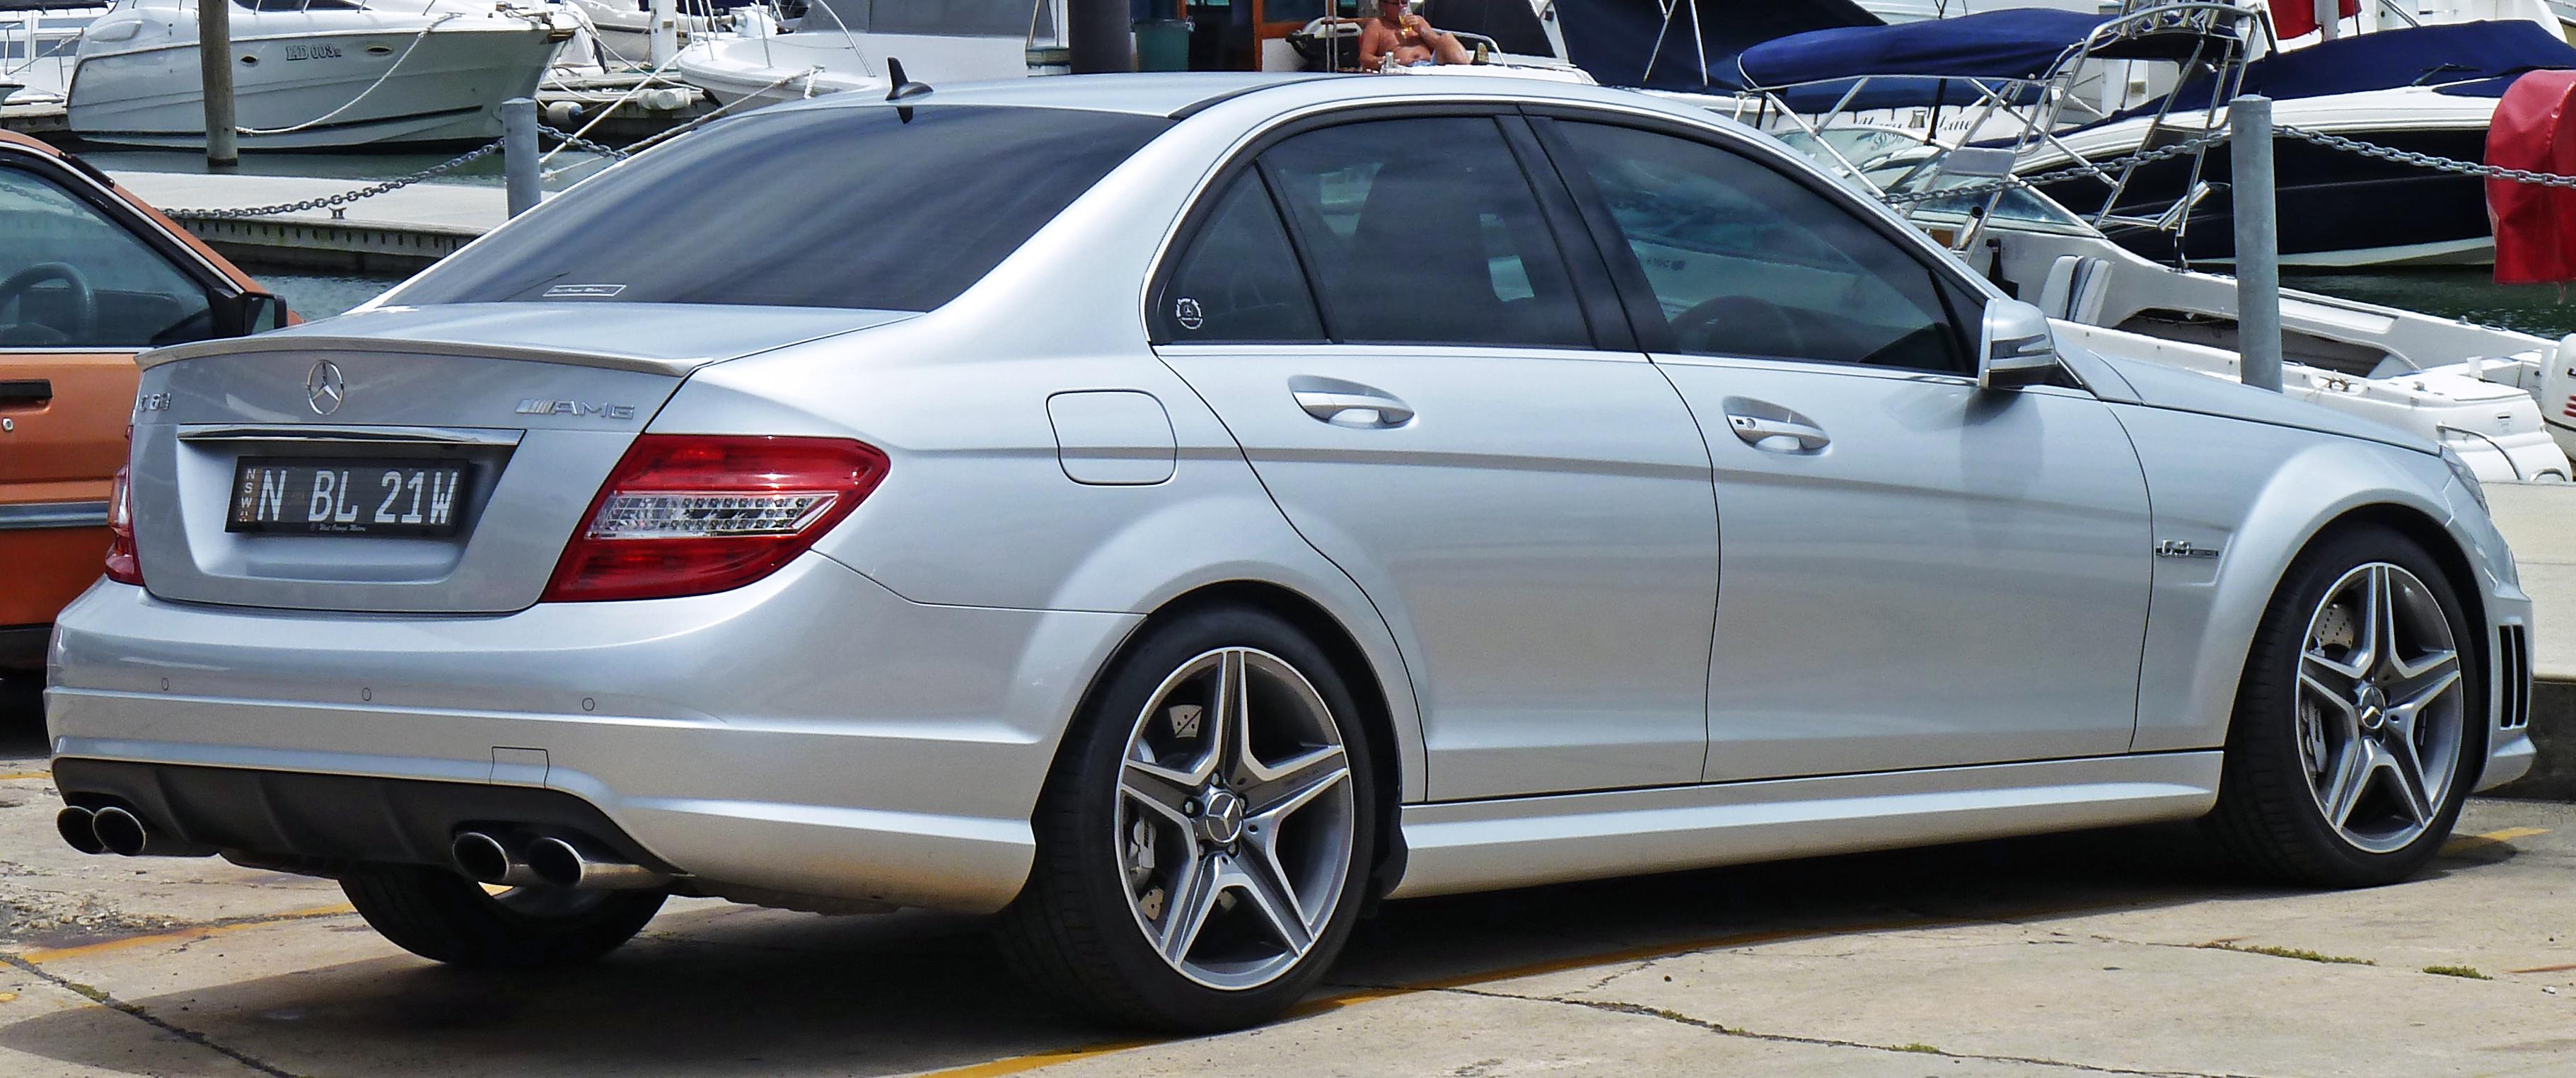 File 2010 mercedes benz c 63 amg w 204 sedan 2010 12 28 for Mercedes benz e350 amg 2010